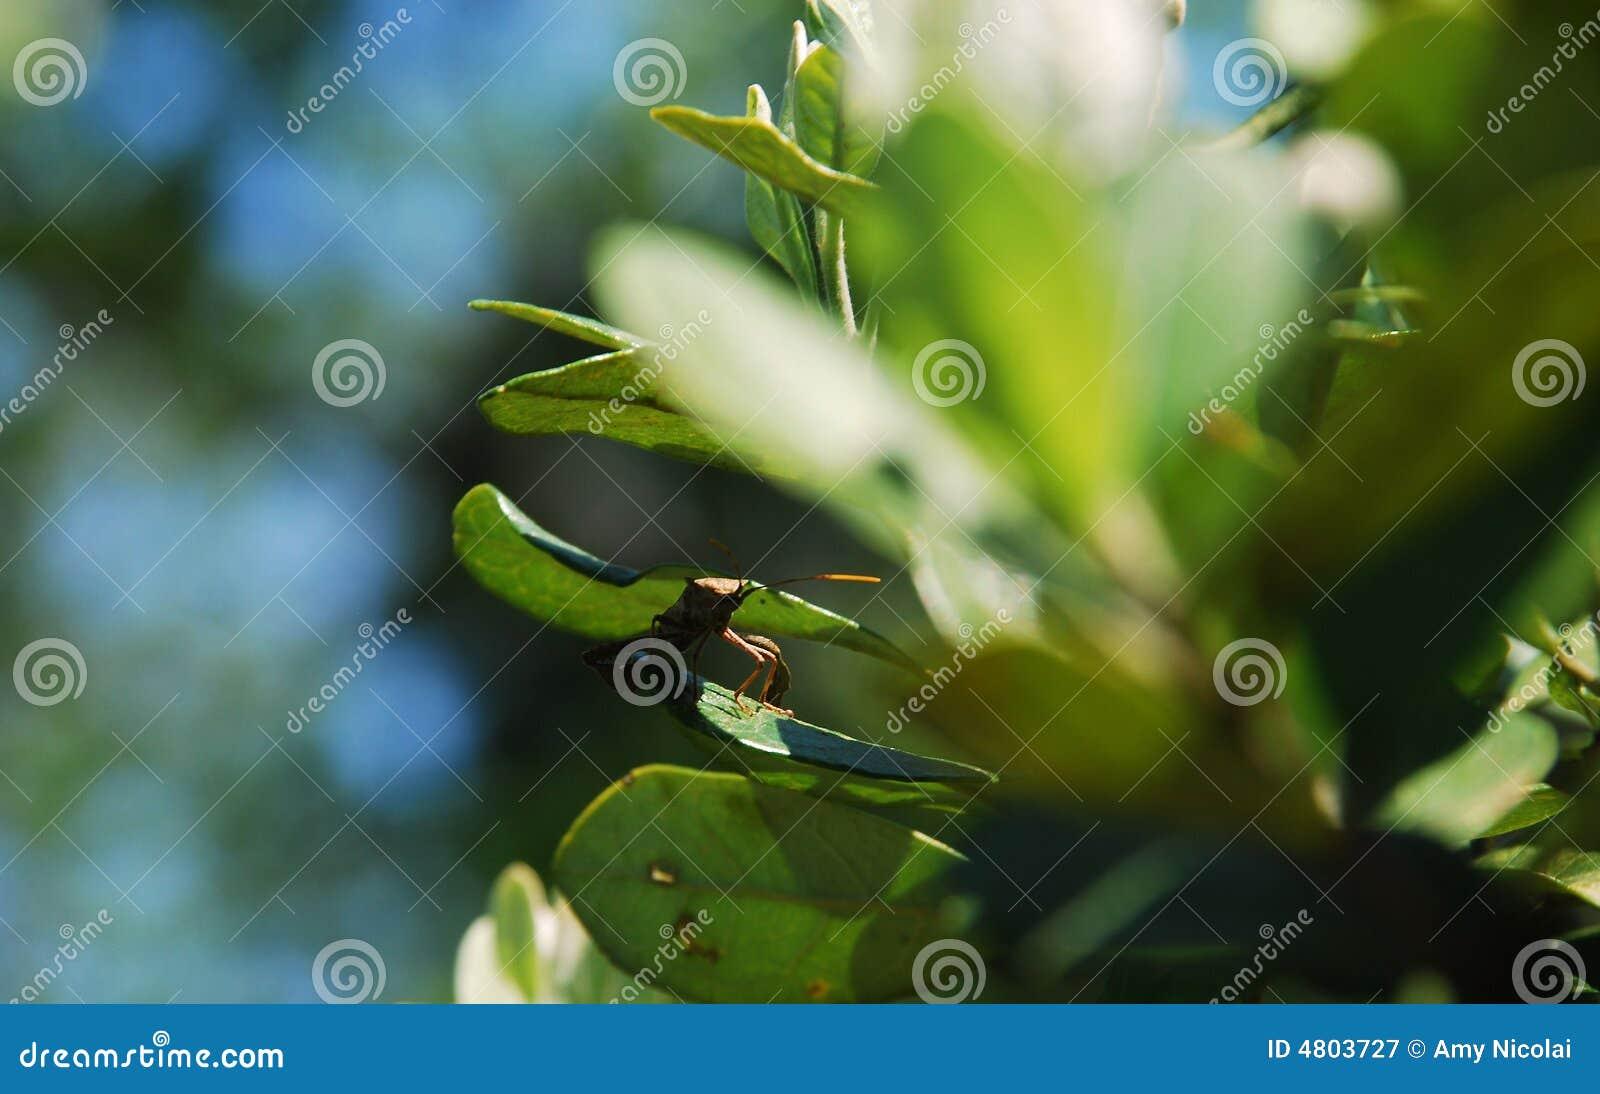 Inseto entre as folhas